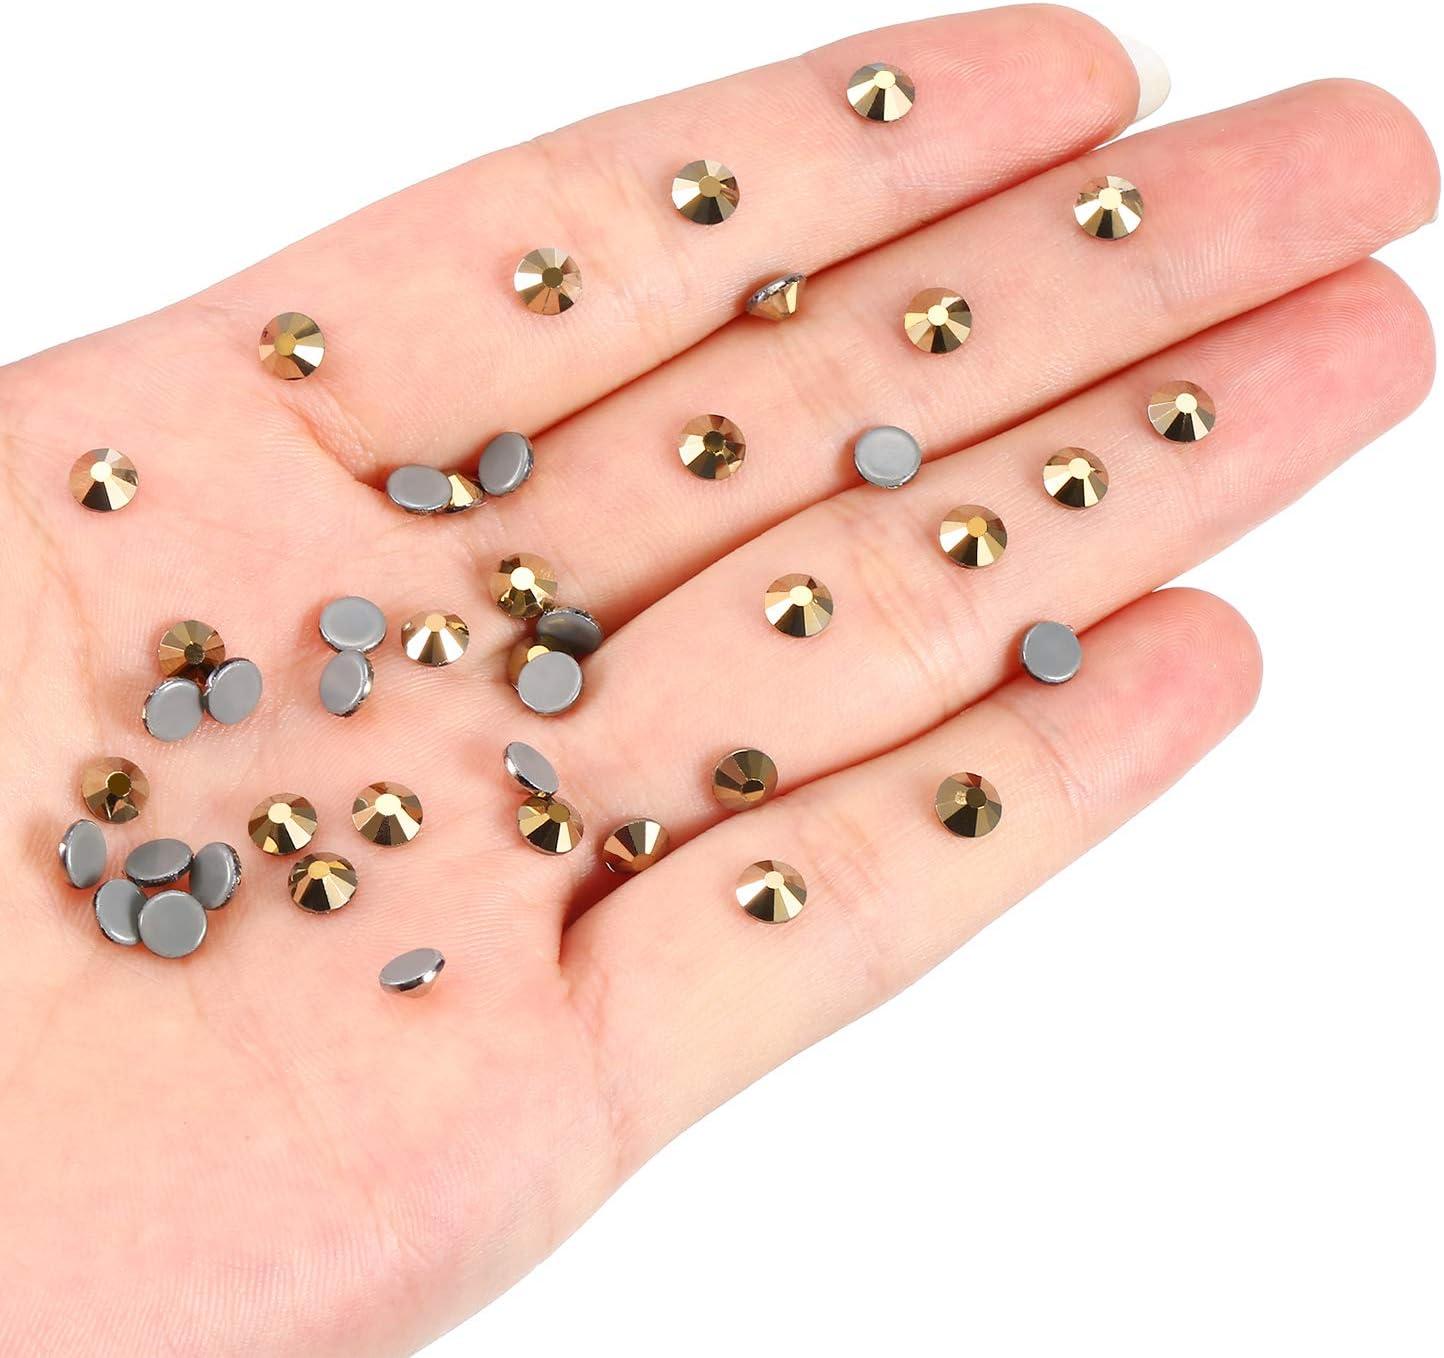 WILLBOND 1440 Pack Hot Fix AB Crystals Flatback Hotfix Rhinestones Round Gems Glass Stones Crystal AB, 4MM